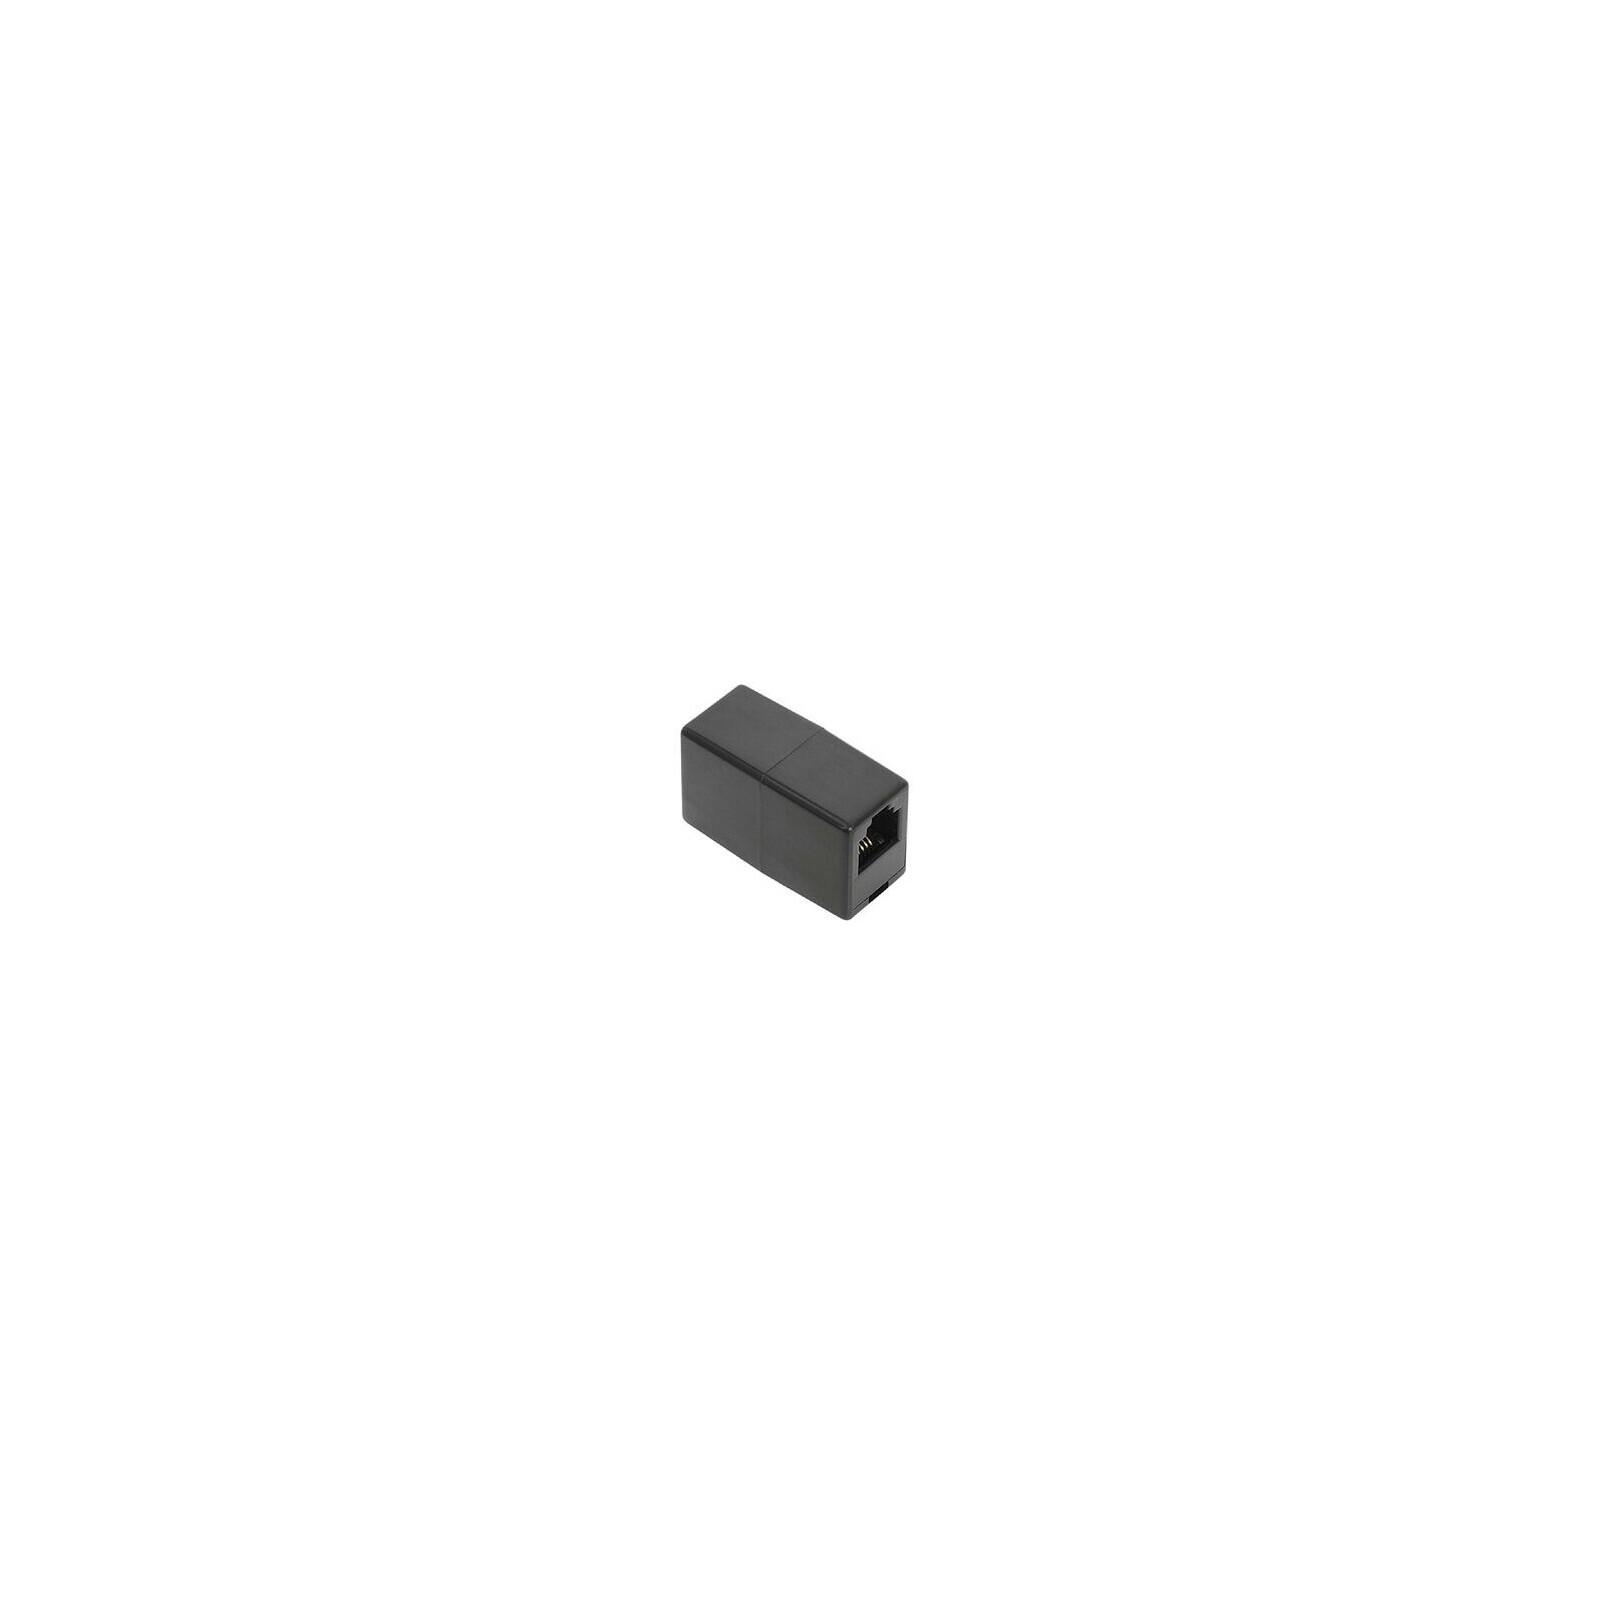 Hama 44854 Modular-Adapter, Kupplung 6p4c - Kupplung 6p4c